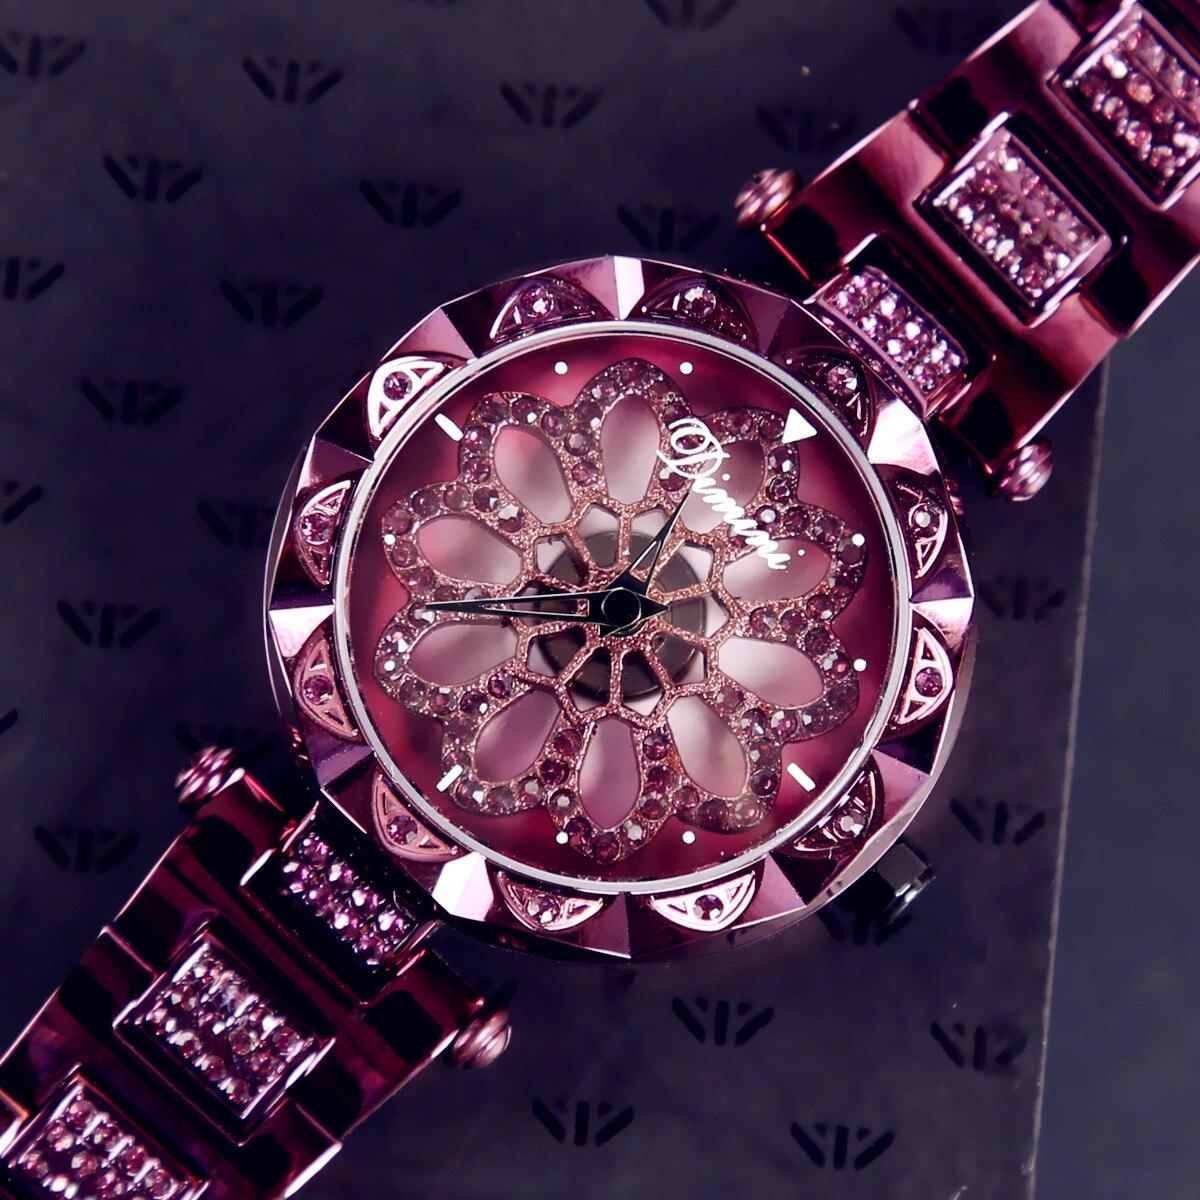 Luxury Reloj Mujer Hombre Women Flower Rosefield Watch Quartz Wristwatches Elegant Relogio Feminino Party Dress Clock Dropship